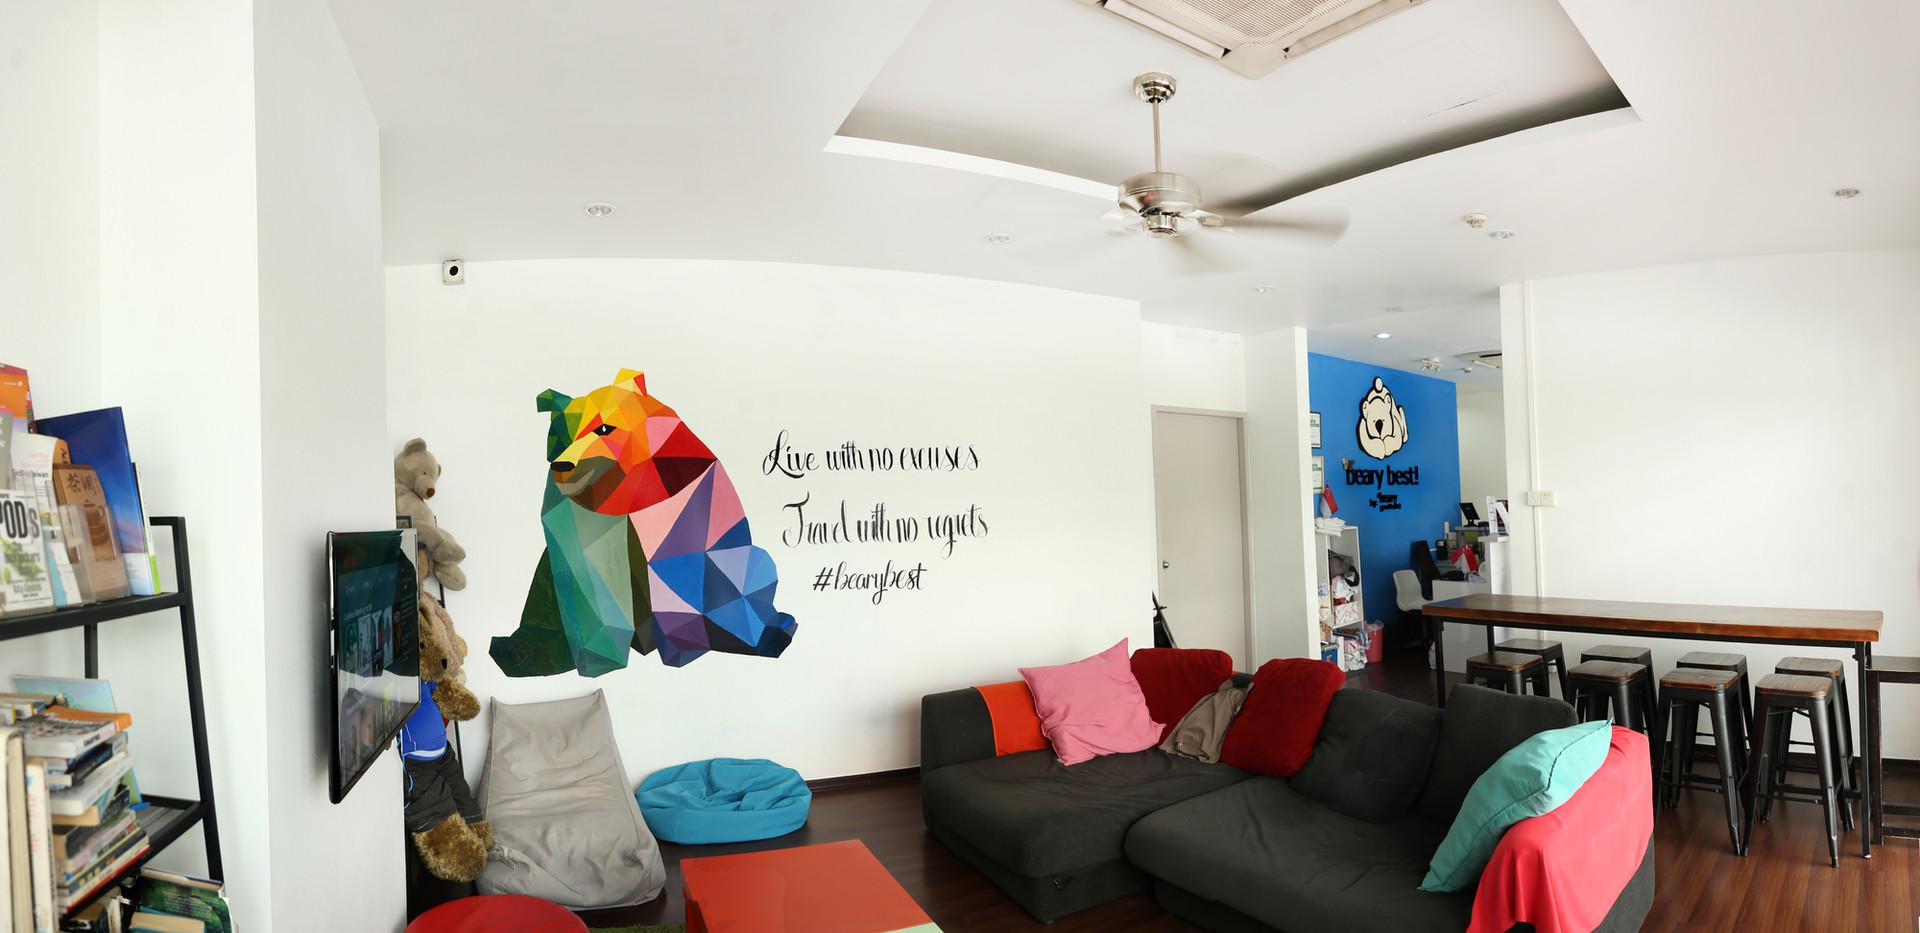 Beary best hostel TV lounge netflix common area